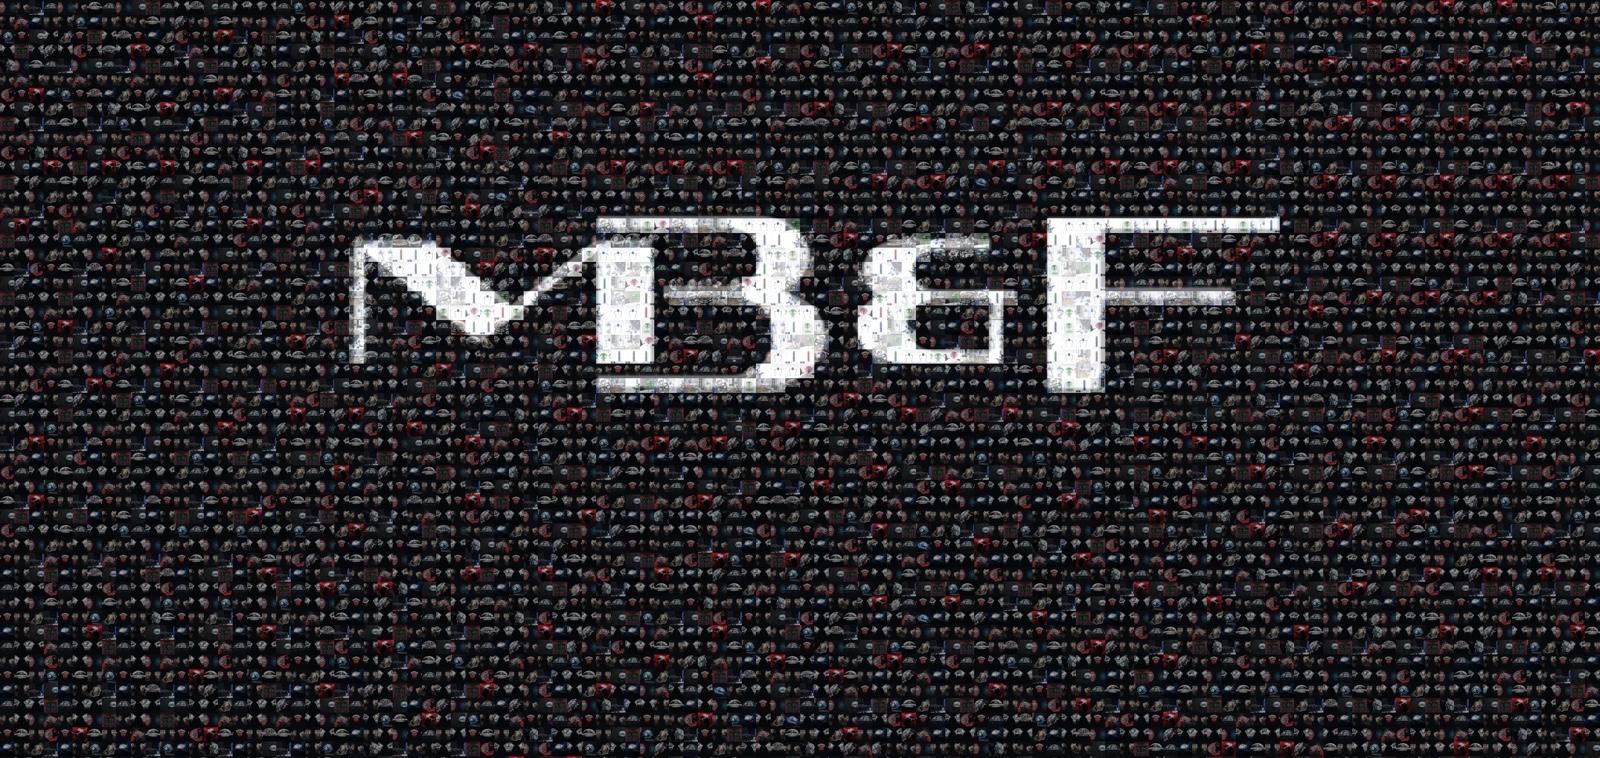 Mosaico-MBF-2019